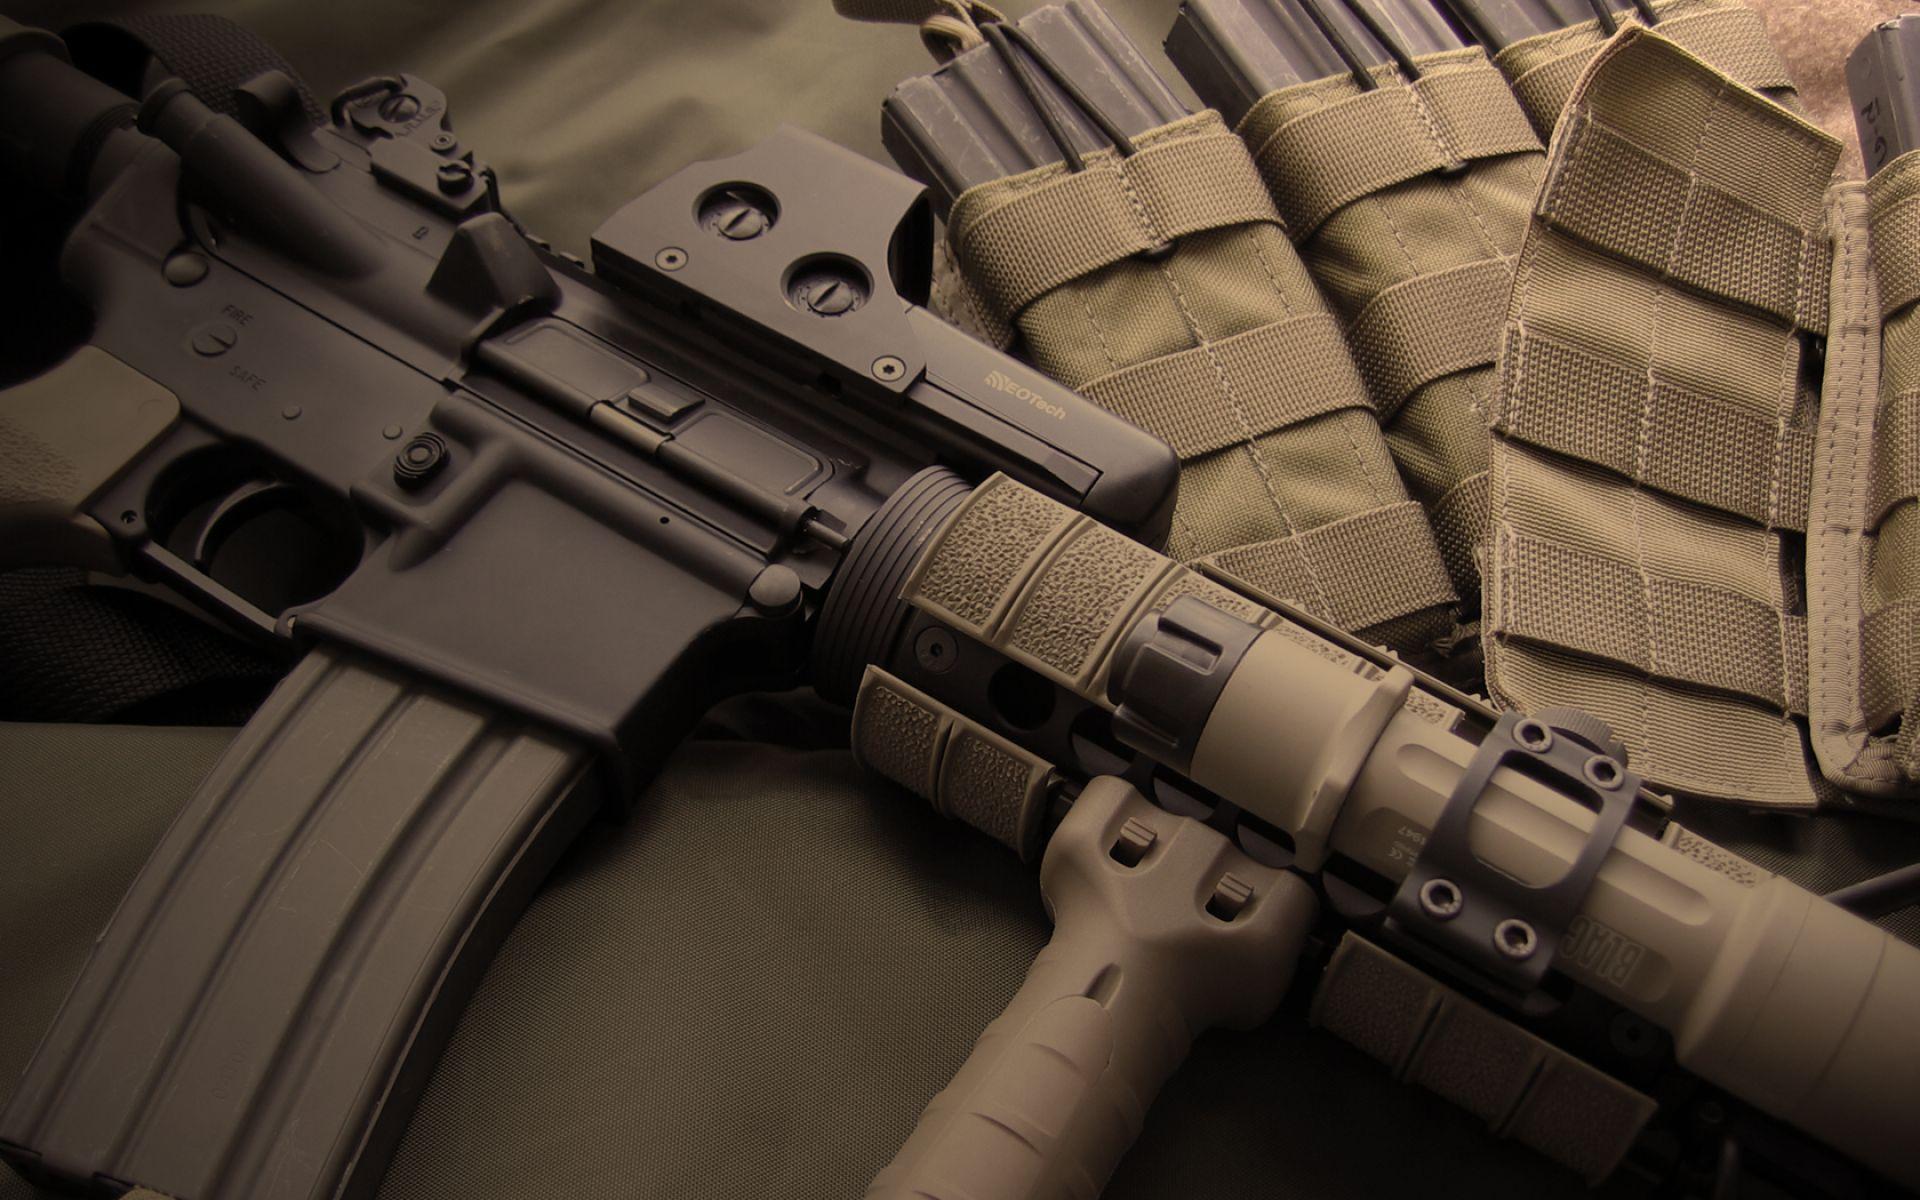 AR-15 / M4 / M-16 | The Savannah Arsenal Project